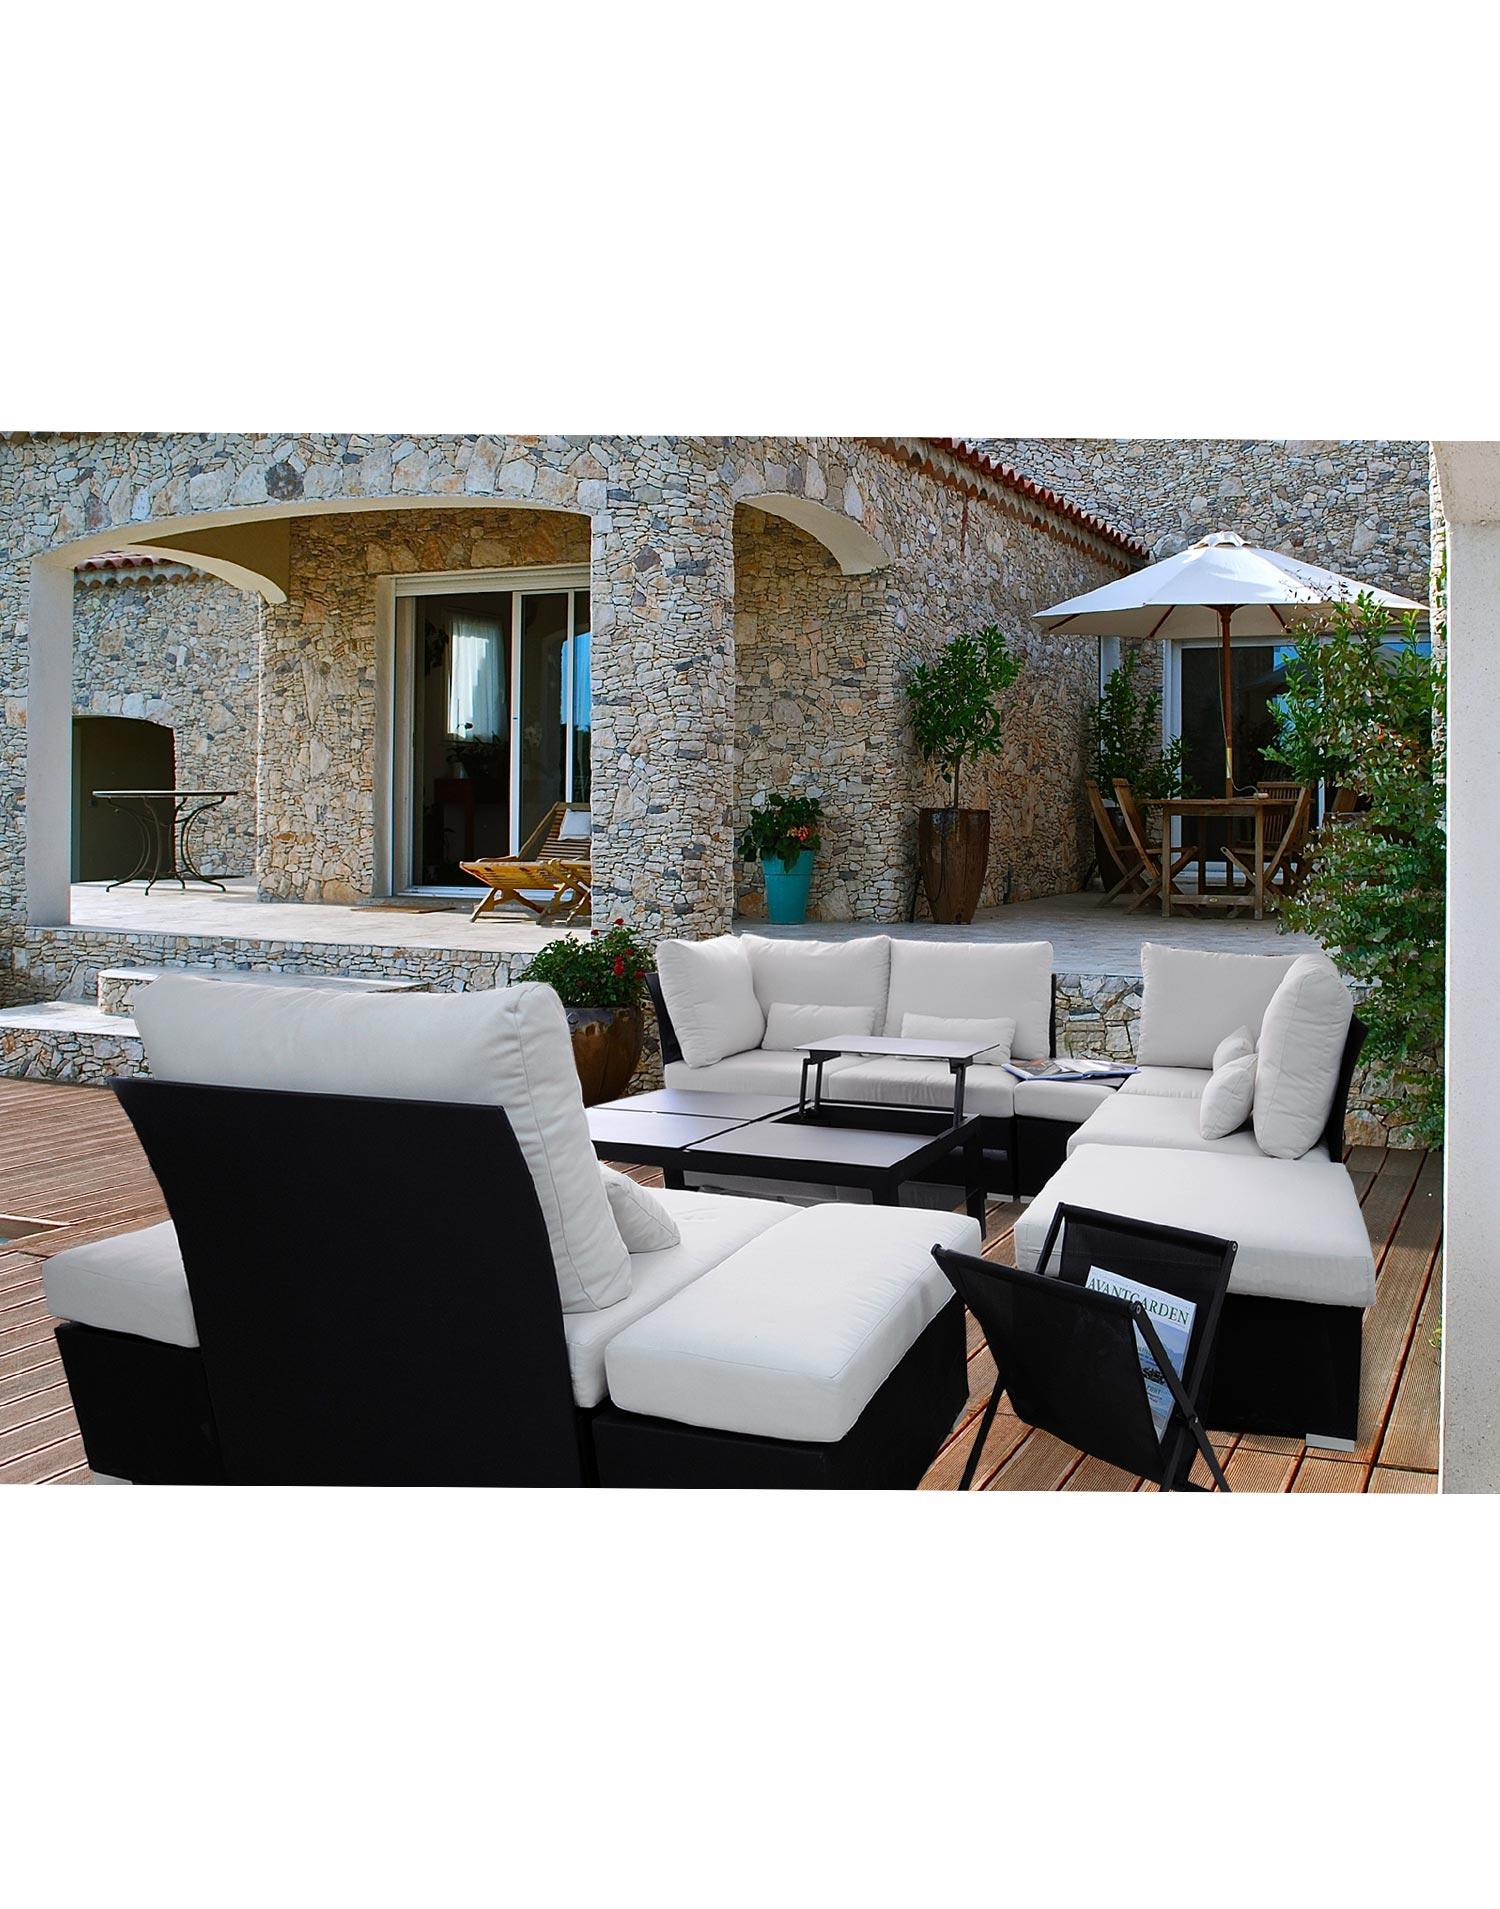 Garten lounge delounge aus textilene - Lounge gartenmobel reduziert ...